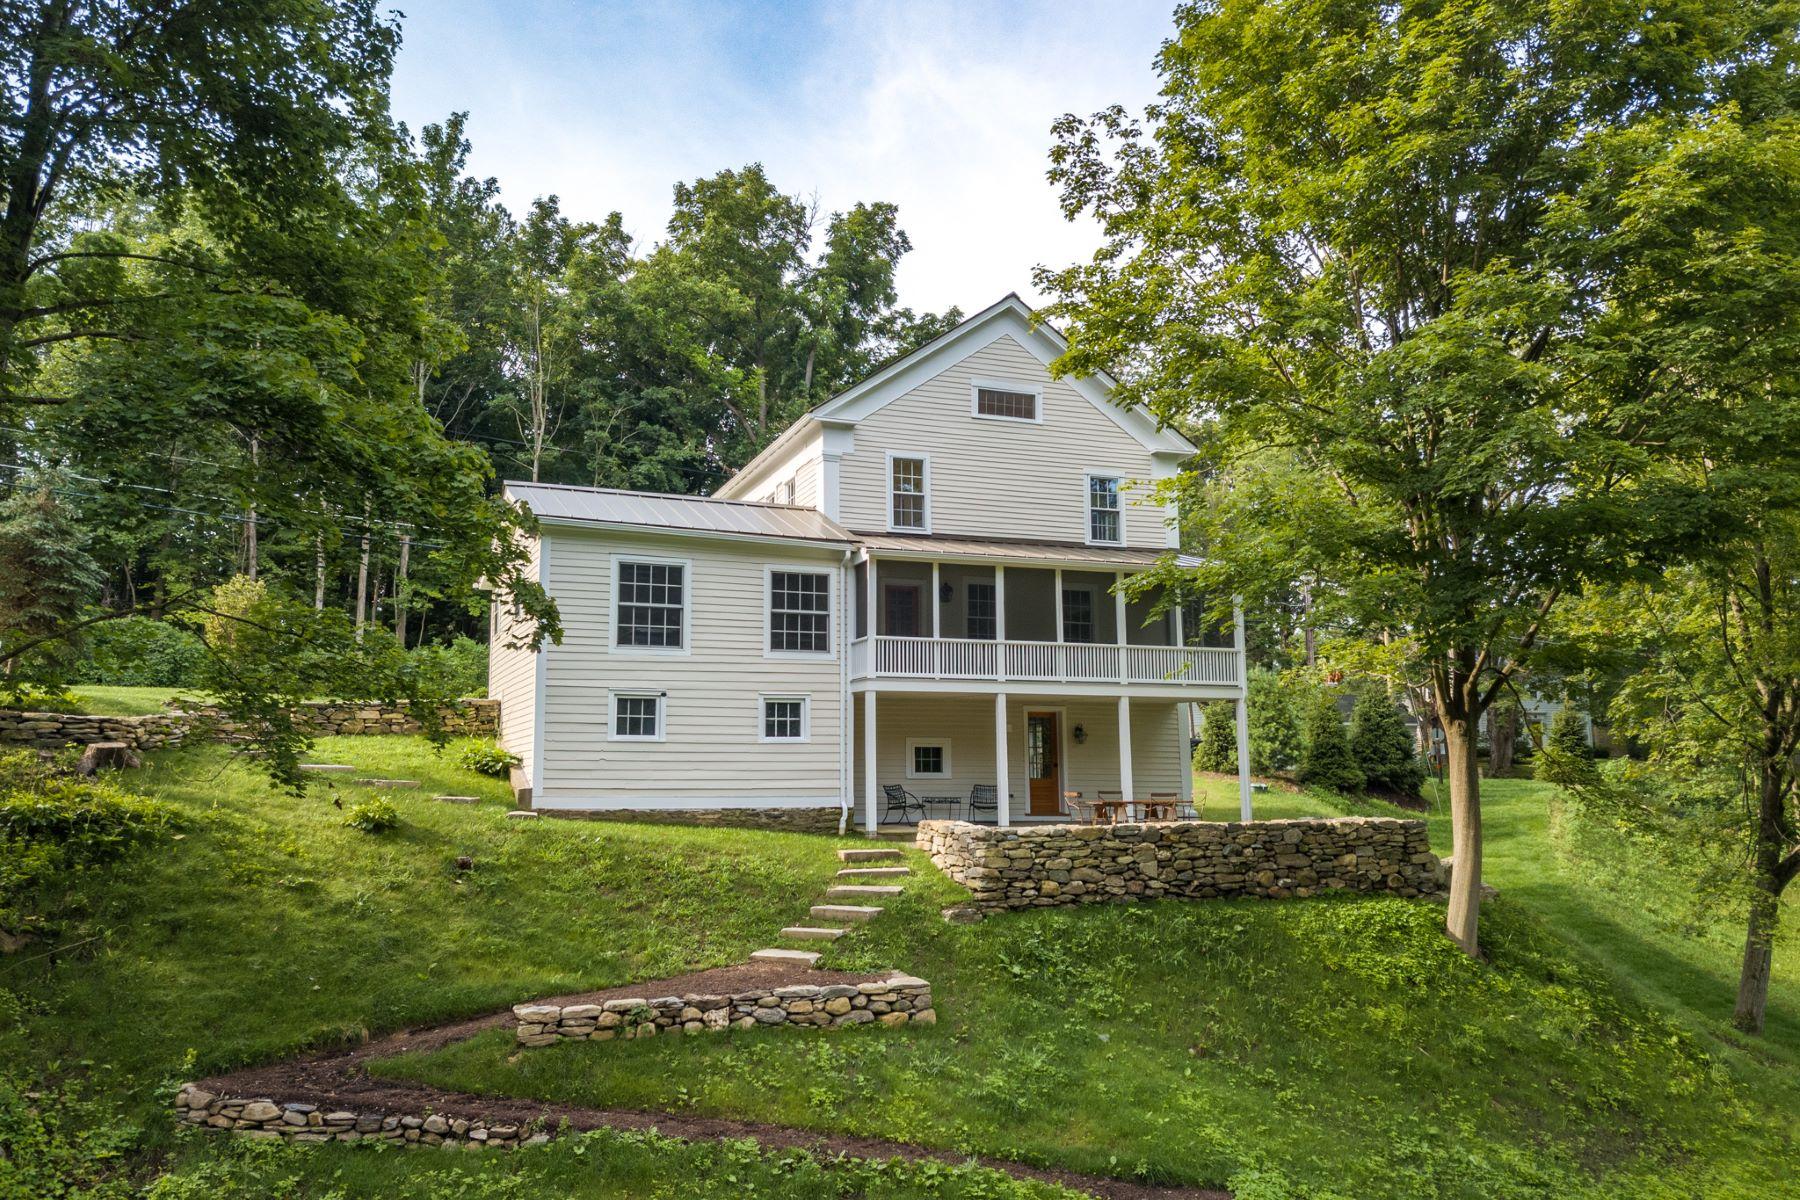 Single Family Homes для того Продажа на FABULOUS RENOVATION 1840 GREEK REVIVAL 68 Calkinstown Road, Sharon, Коннектикут 06069 Соединенные Штаты